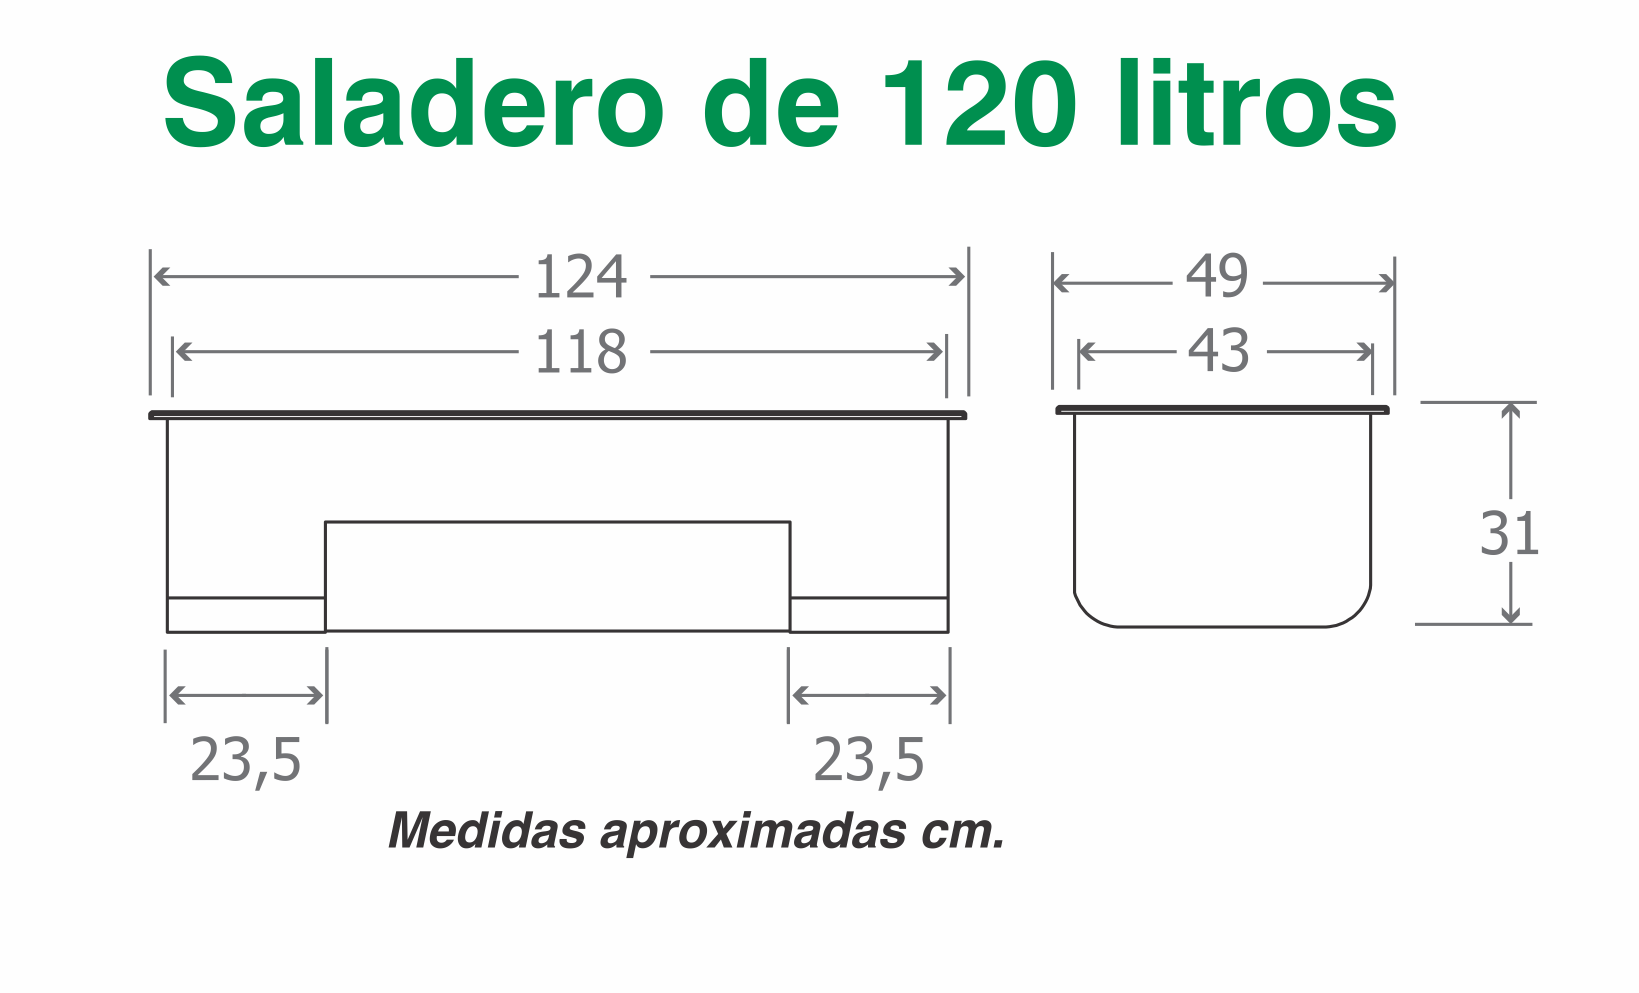 SALADERO 120 LITROS MEDIDAS.png